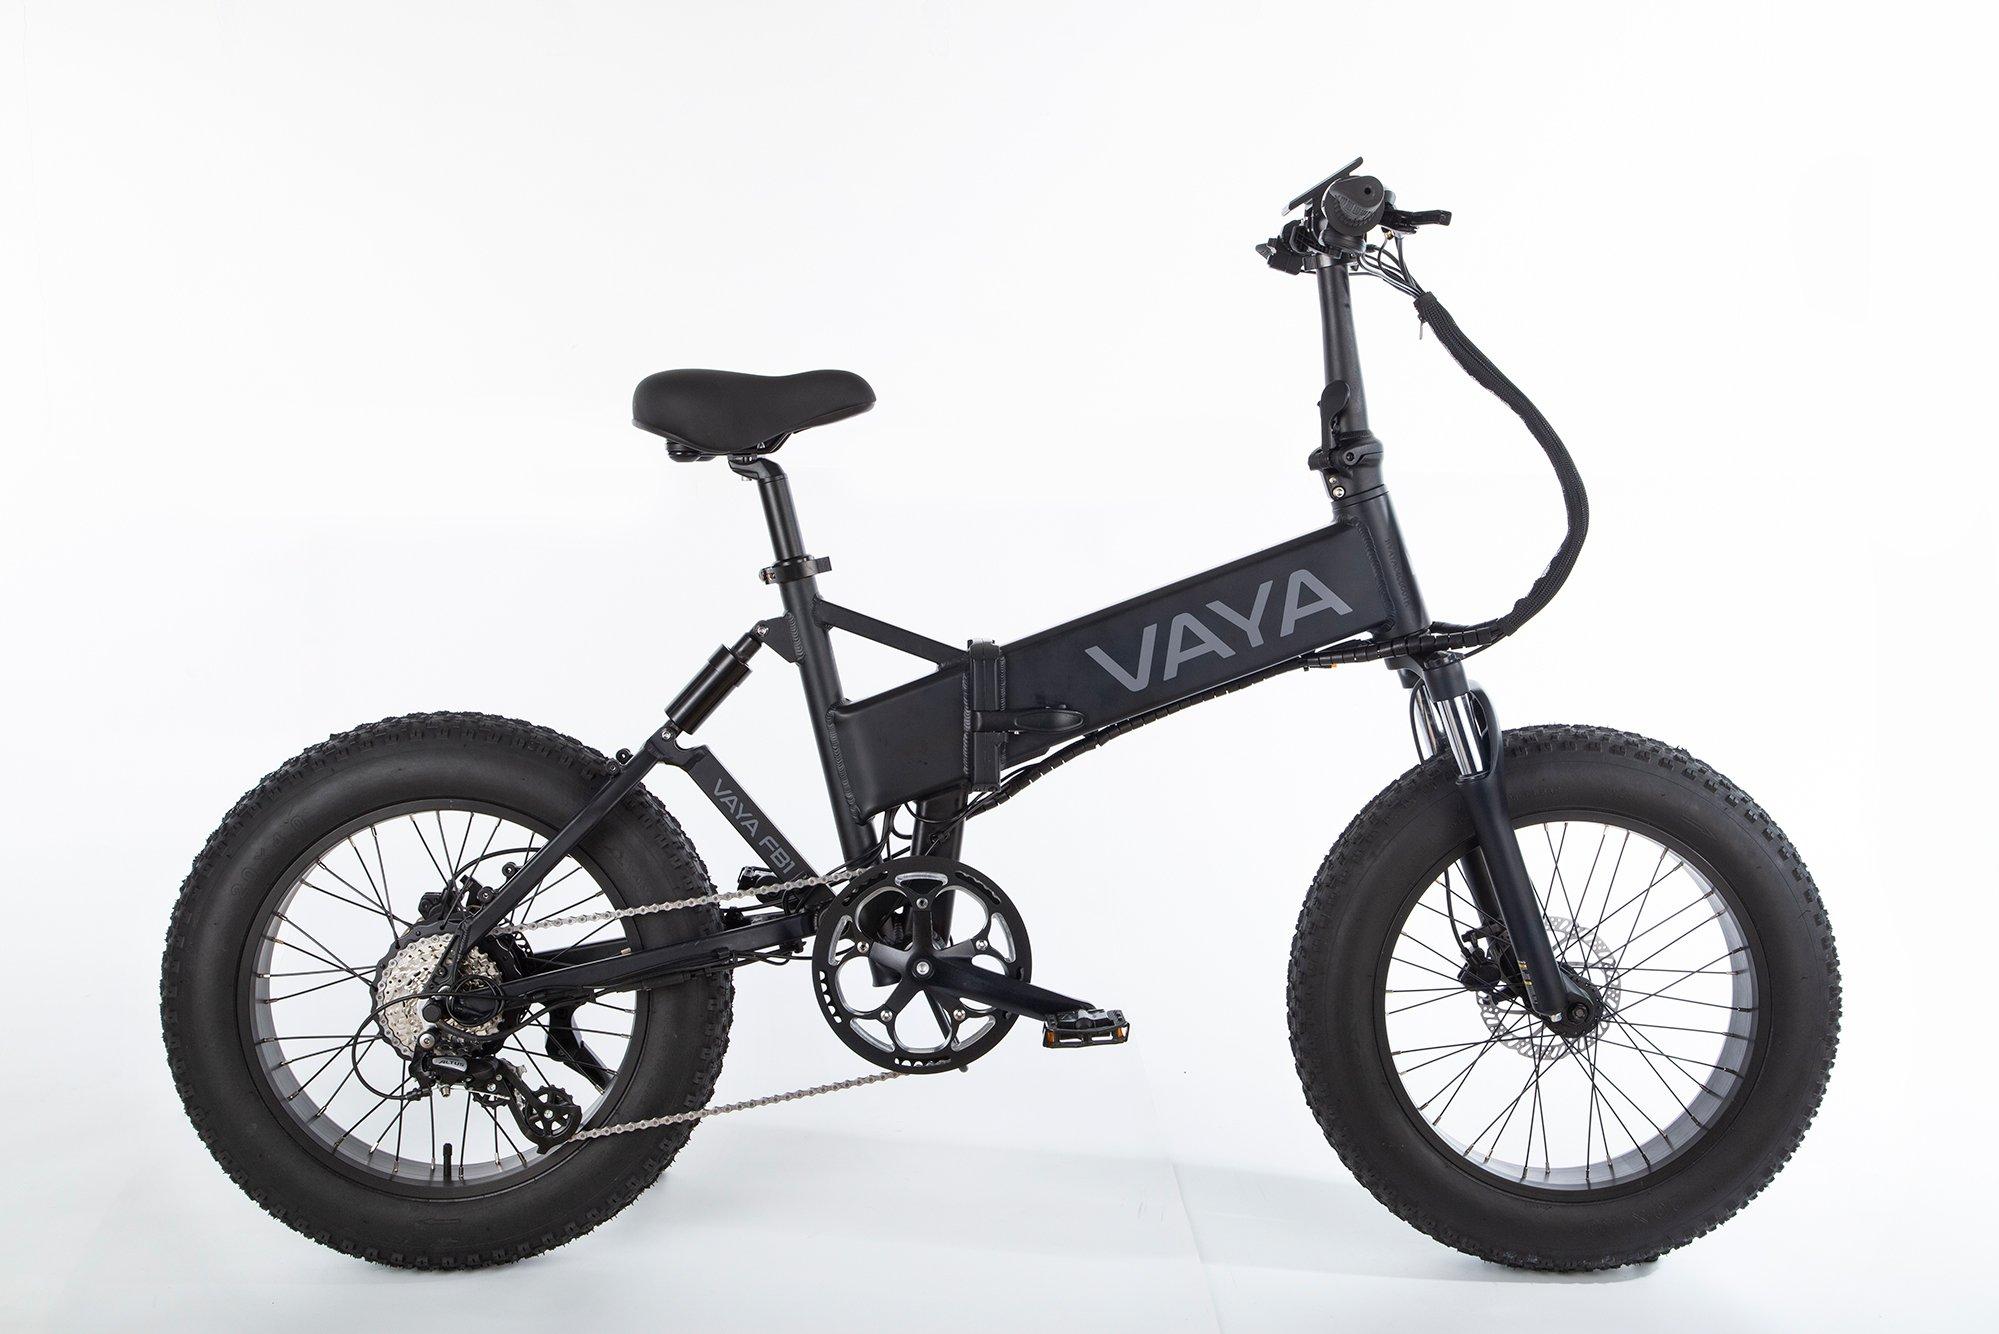 Vaya - Fatbike FB-1 E-Bike - Electric Bike - Black (1647BL)